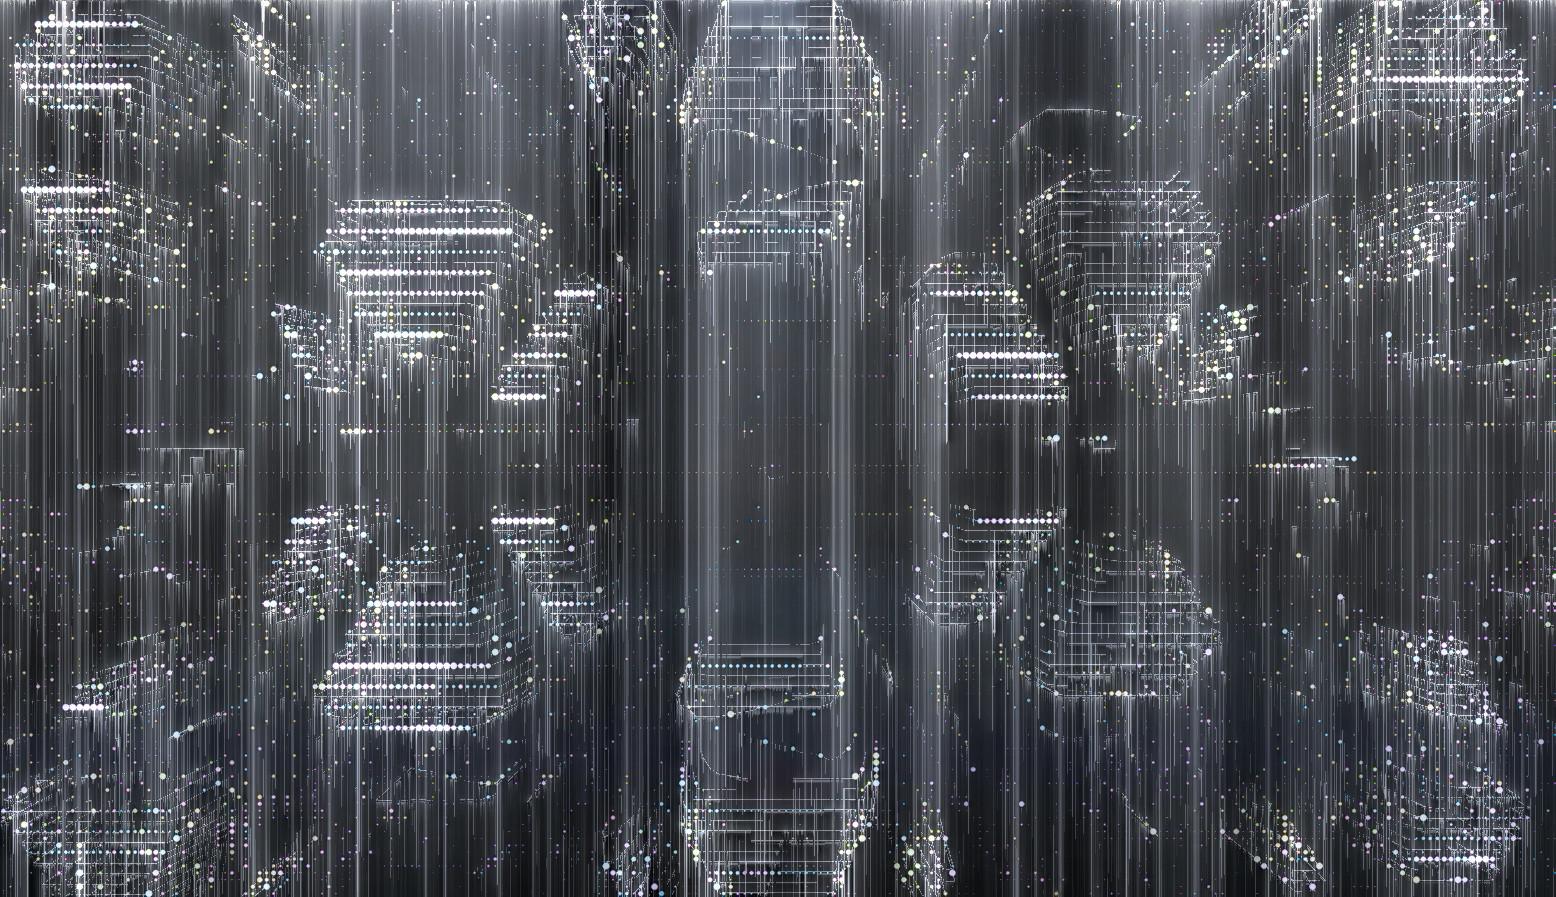 Kresimir jelusic robob3ar 337 140916